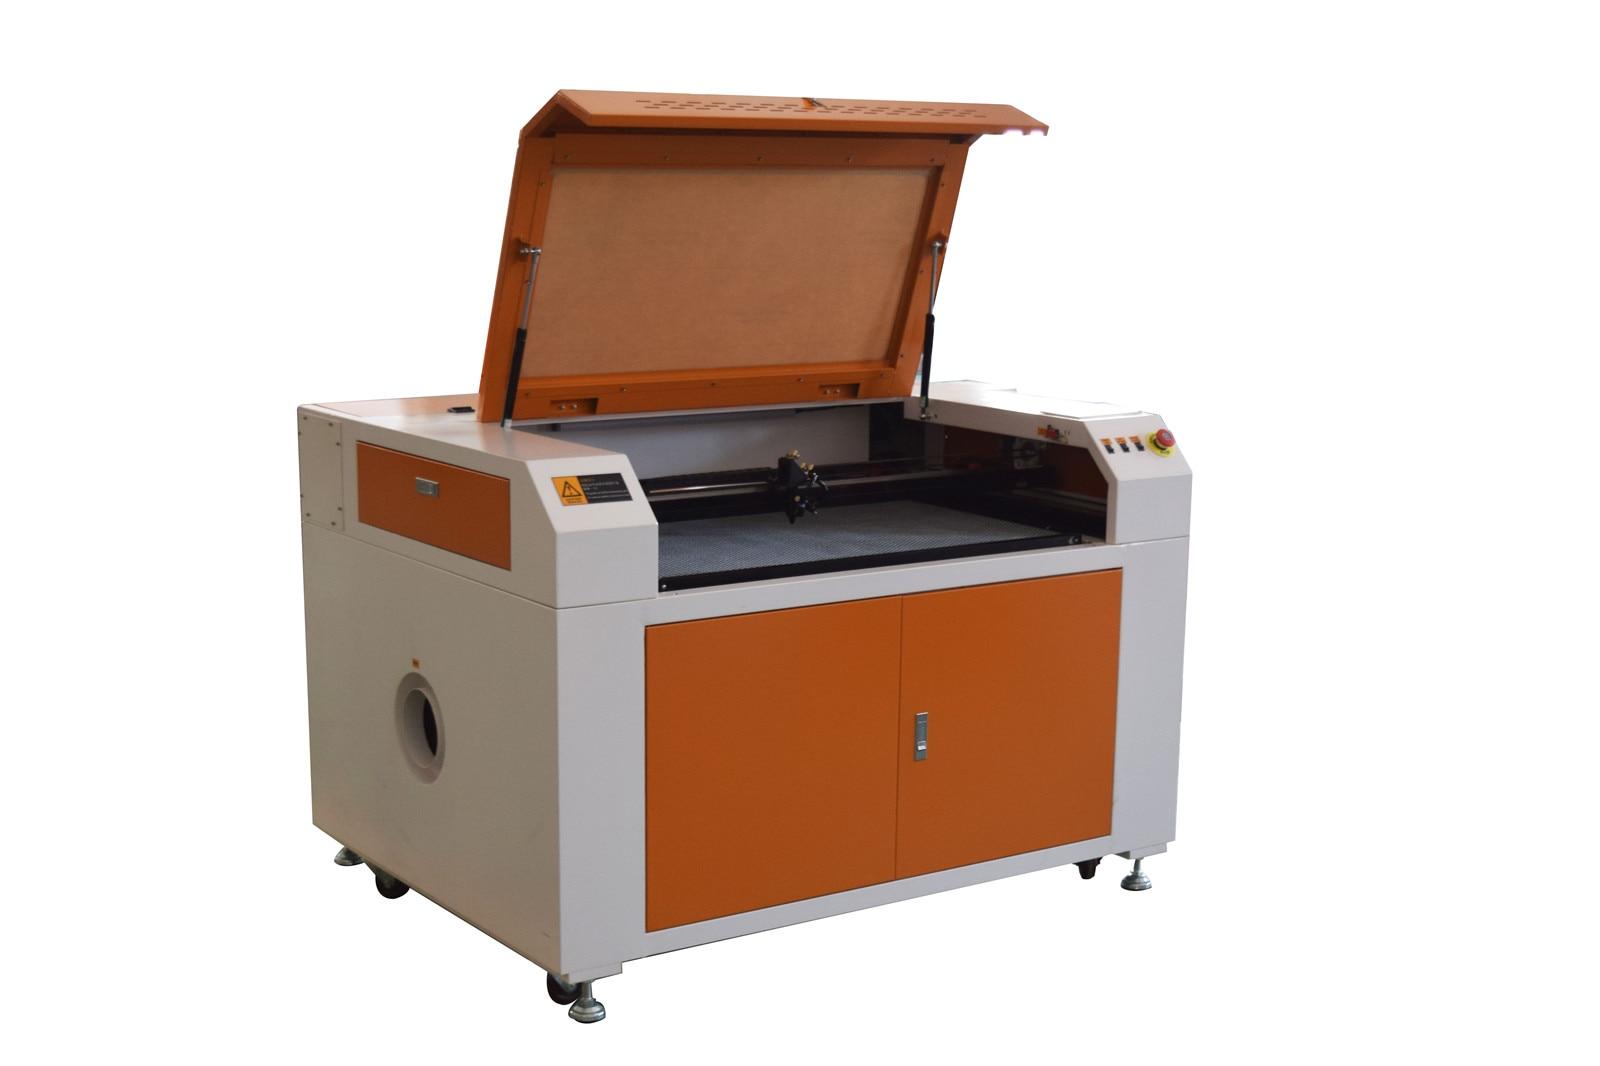 100W CO2 LASER ENGRAVER 900x600 ENGRAVING MACHINE KH9060-100W WOODWORKING/CRAFTS USB U-FLASH